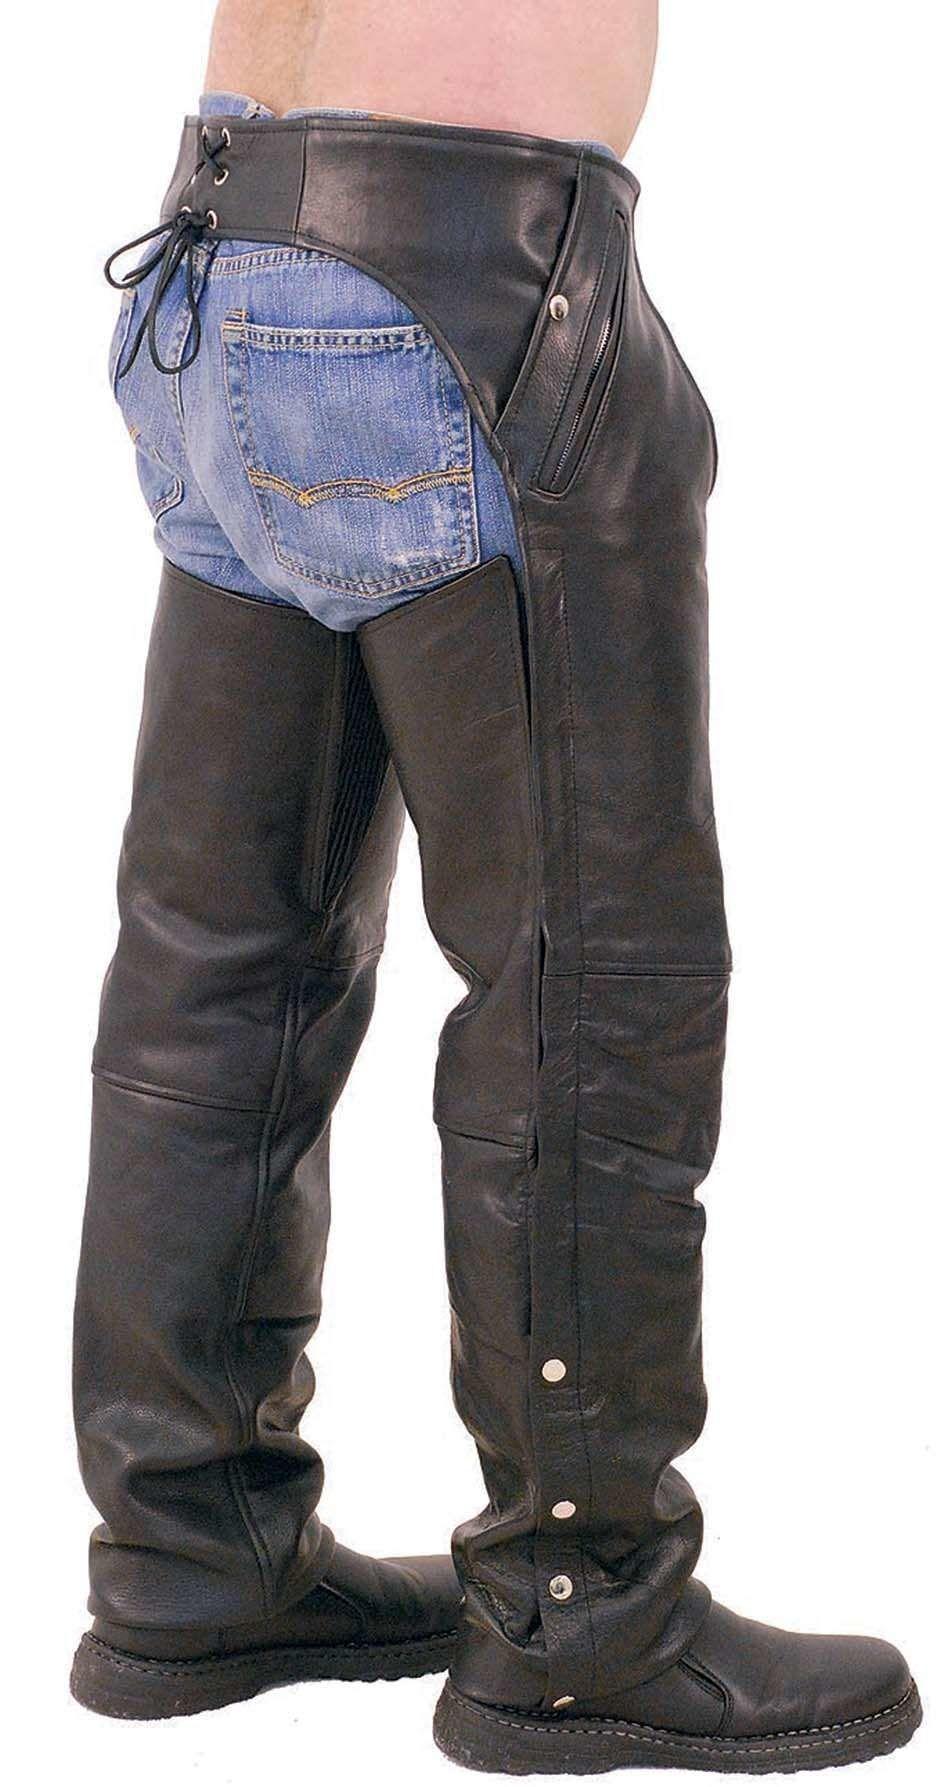 Unisex Premium Leather Chaps W Snap Out Lining C5077spk Chaps Leather Chaps Fashion Pants